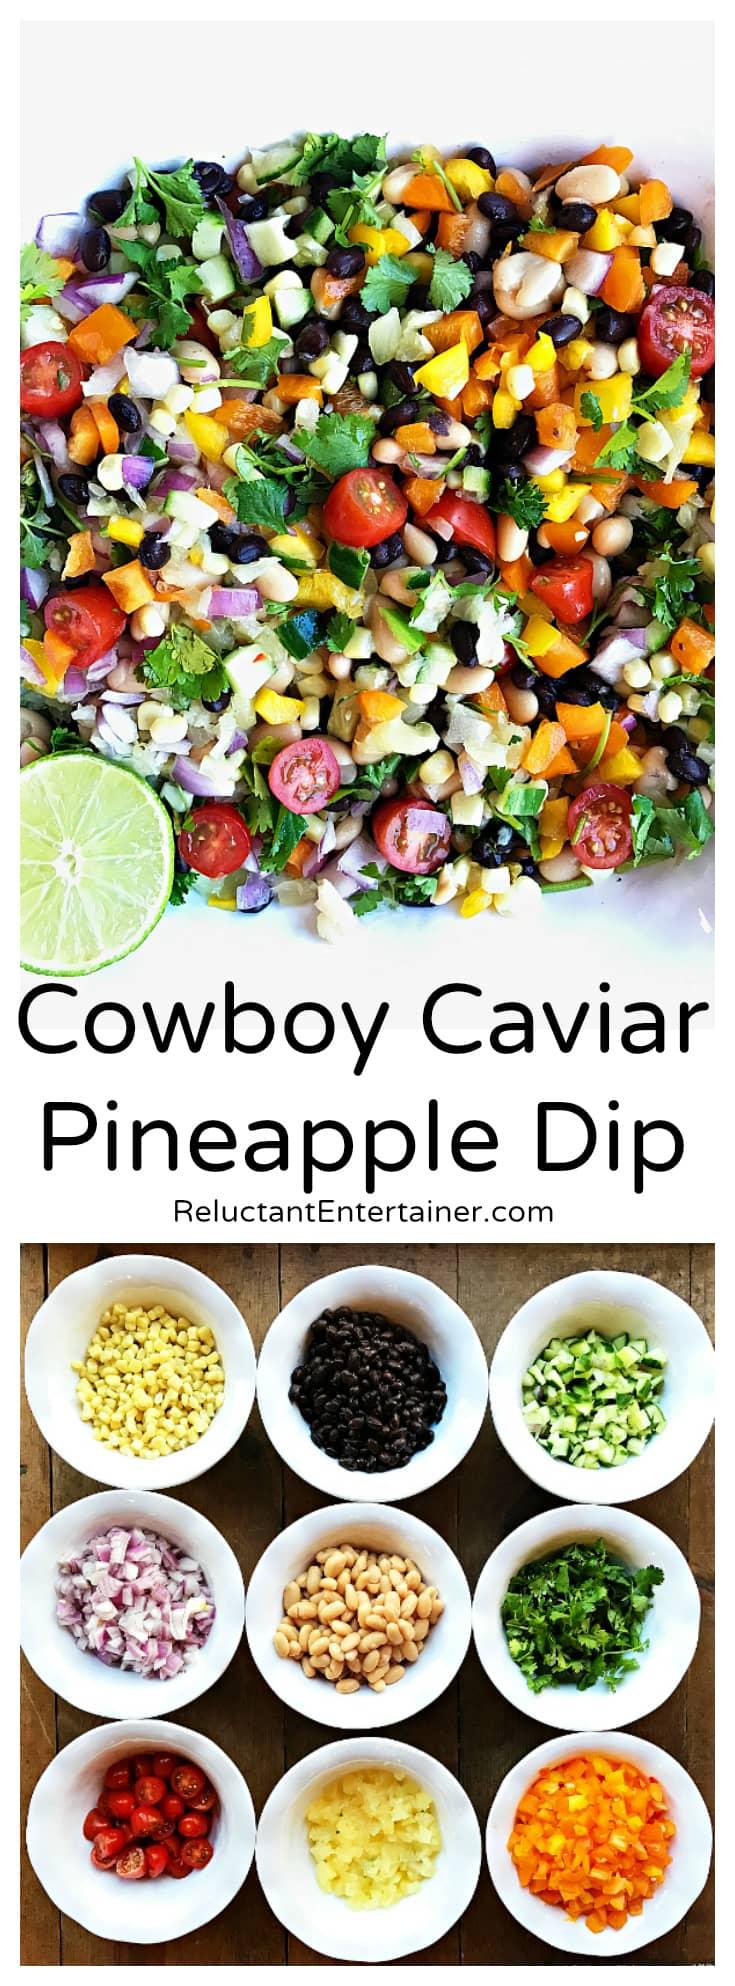 Cowboy Caviar Pineapple Dip